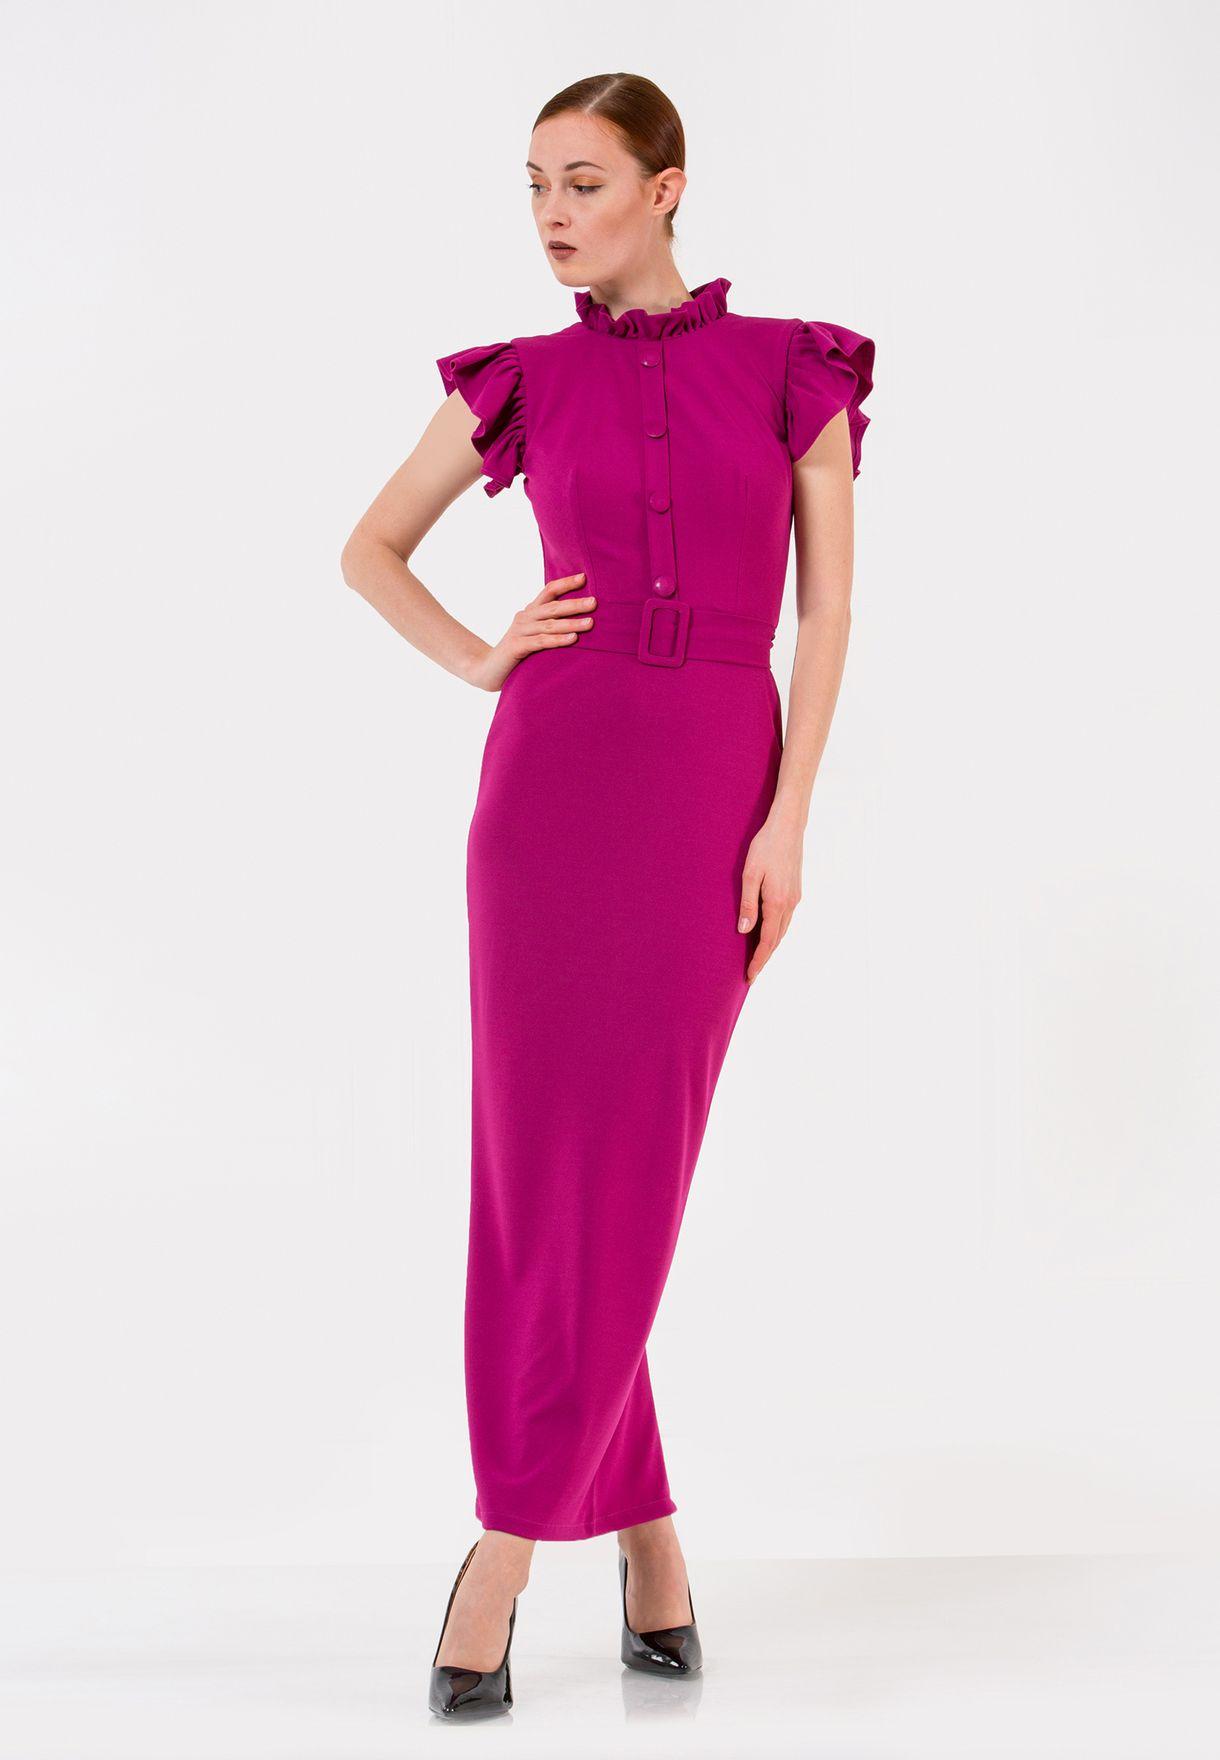 Ruffle Trim Belted Dress